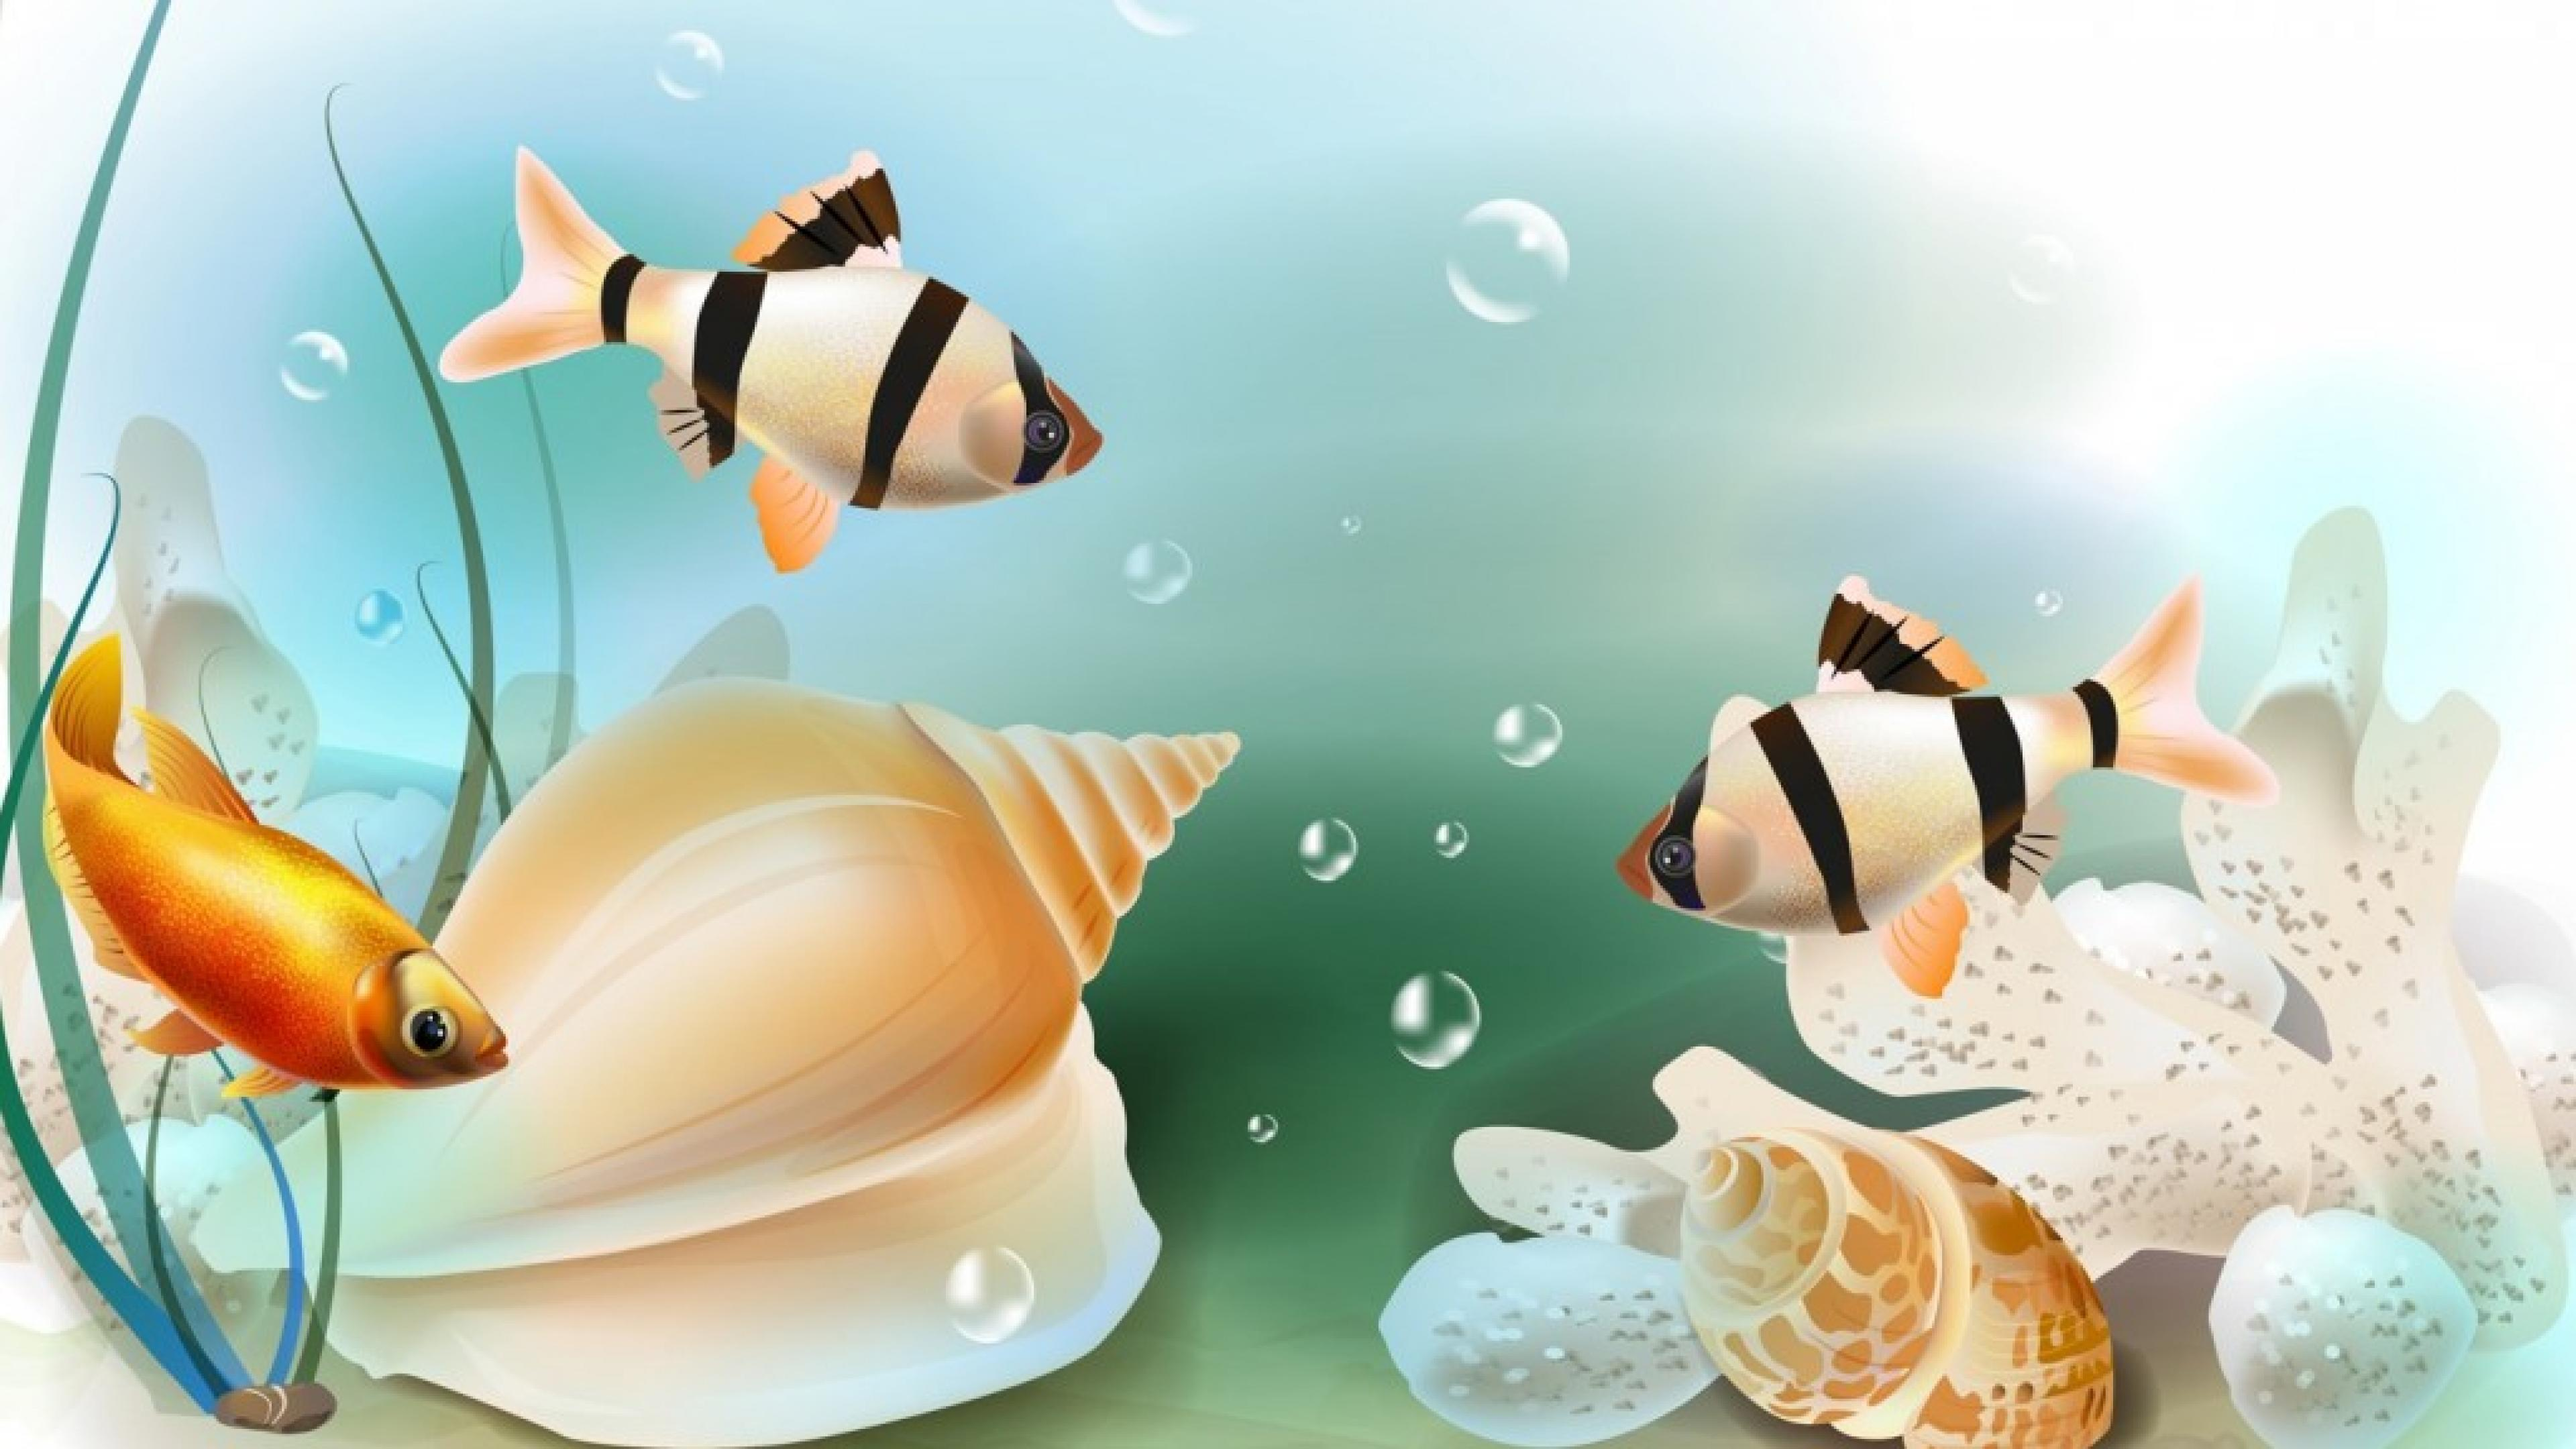 Koi Fish 3d Animated Wallpaper Fish Wallpapers Hd Pixelstalk Net